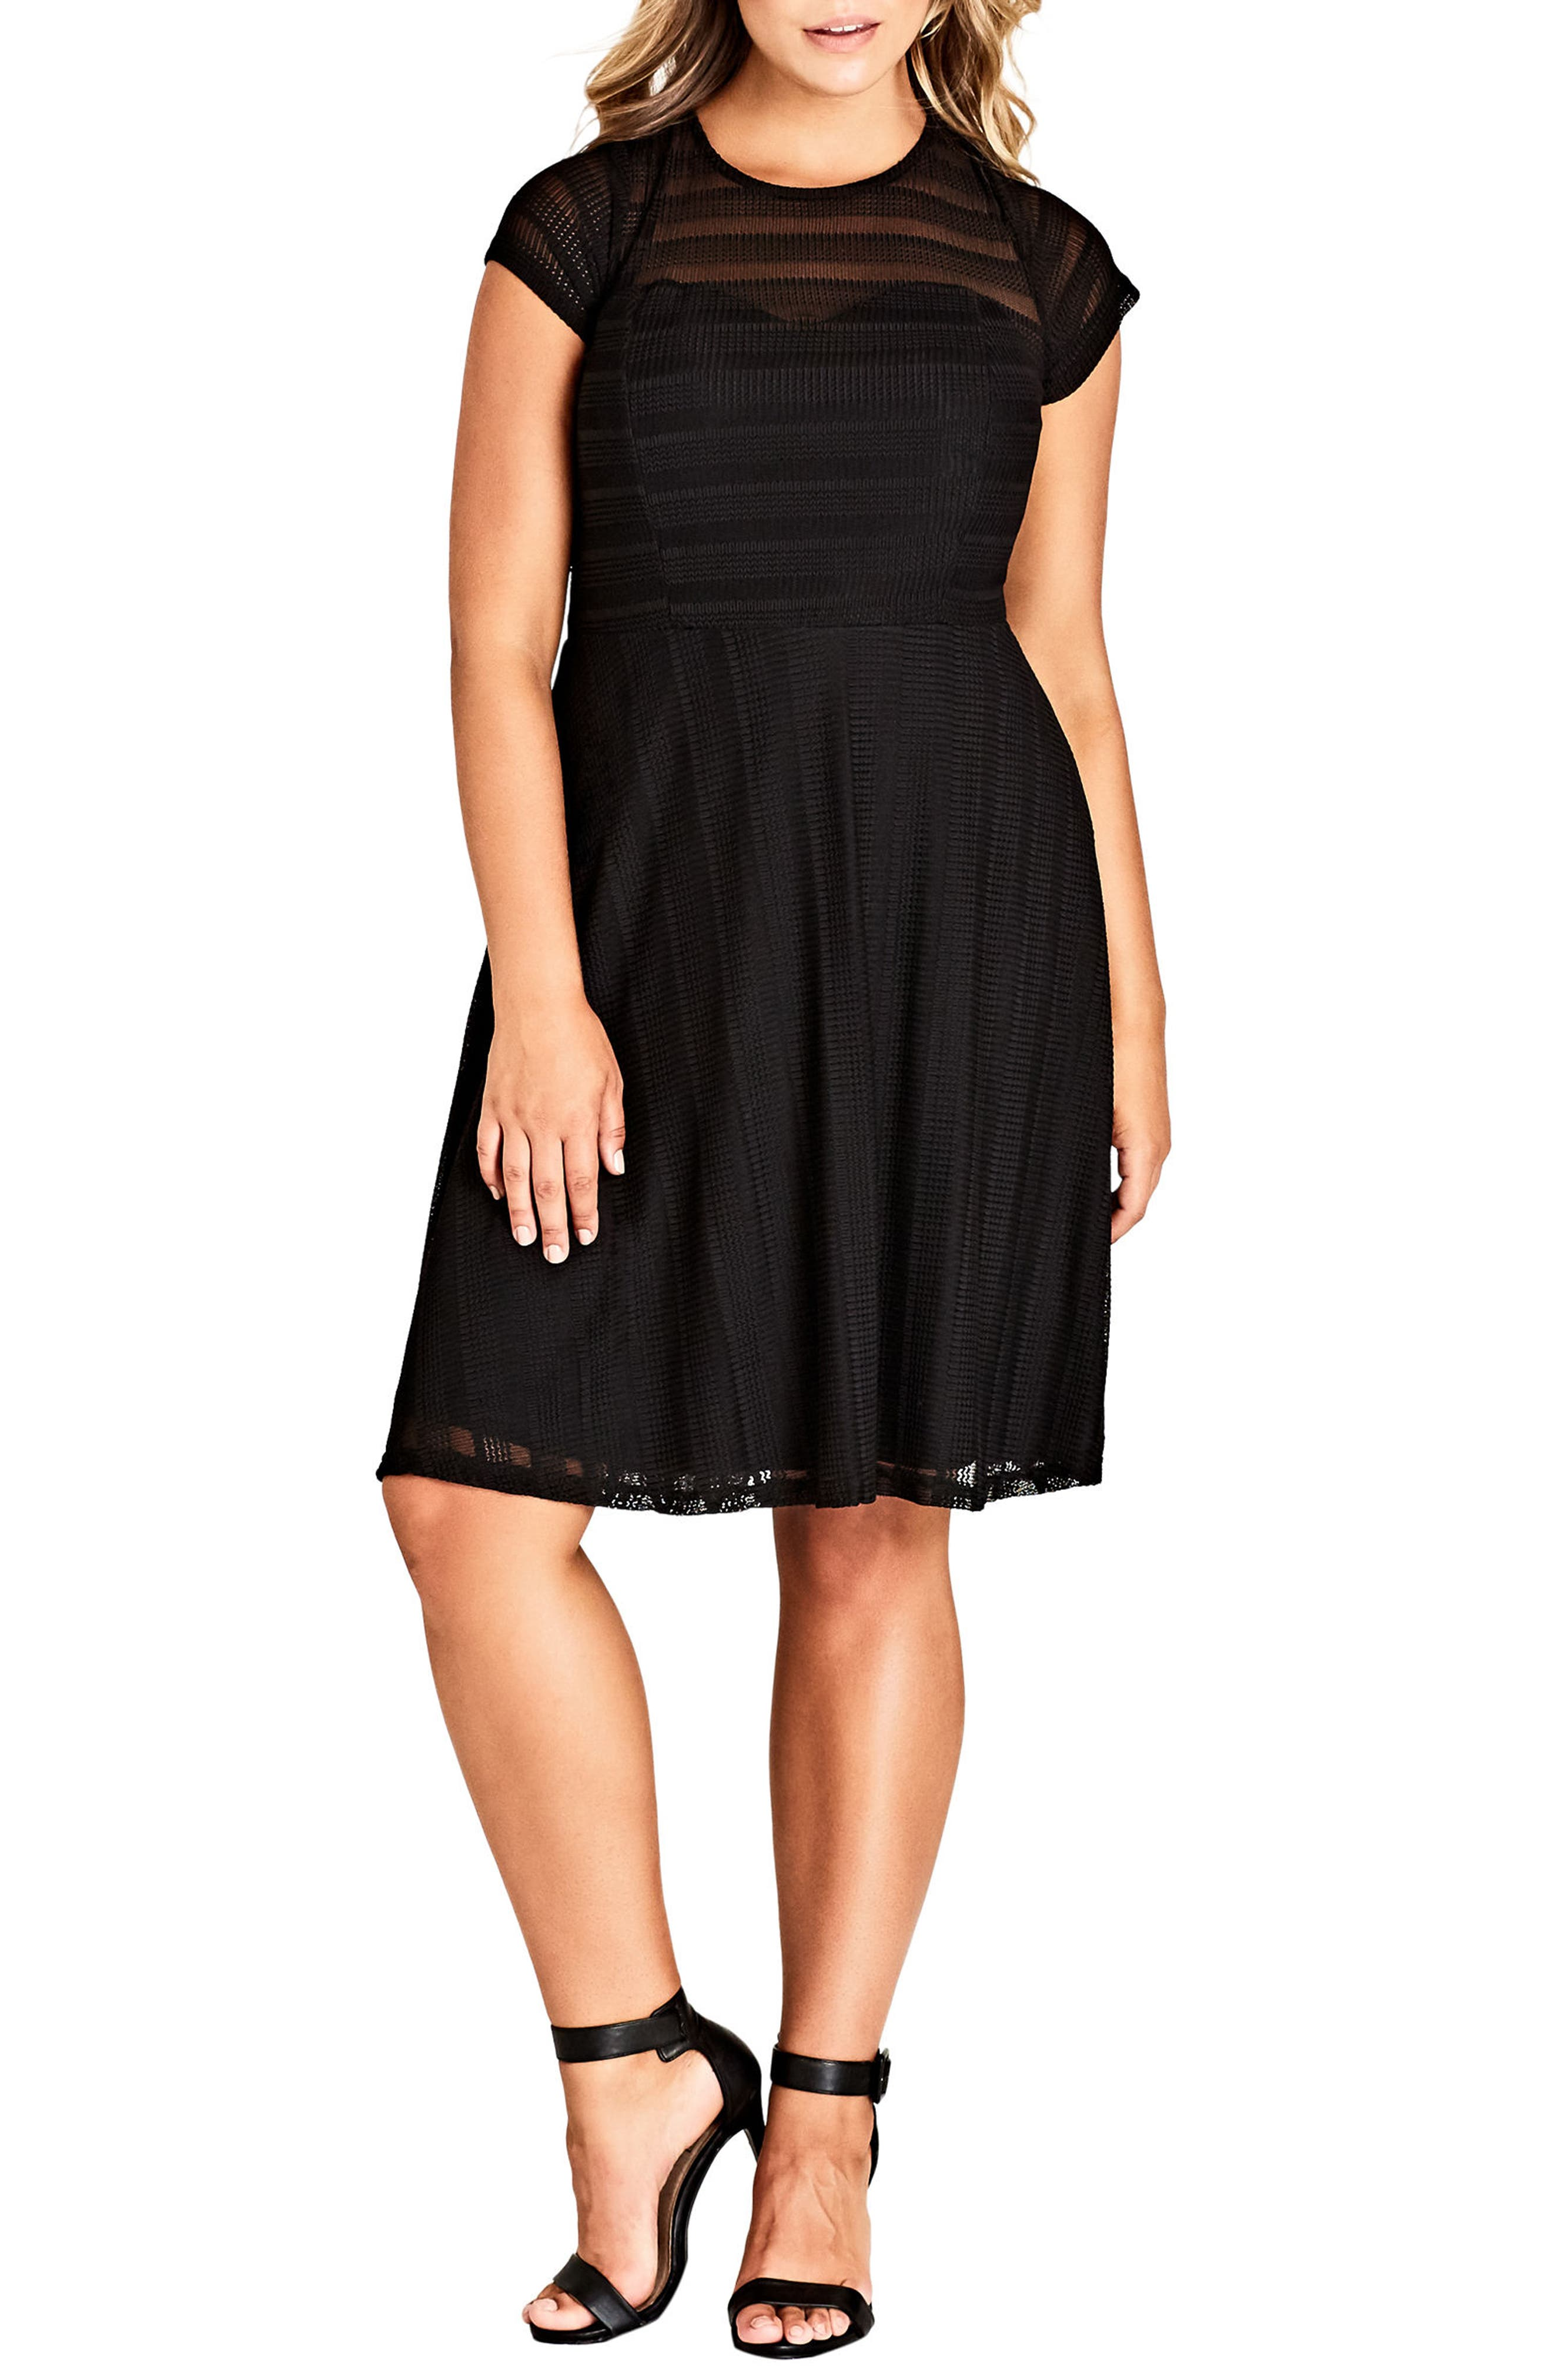 Plus Size City Chic Textured Heart Dress, Black